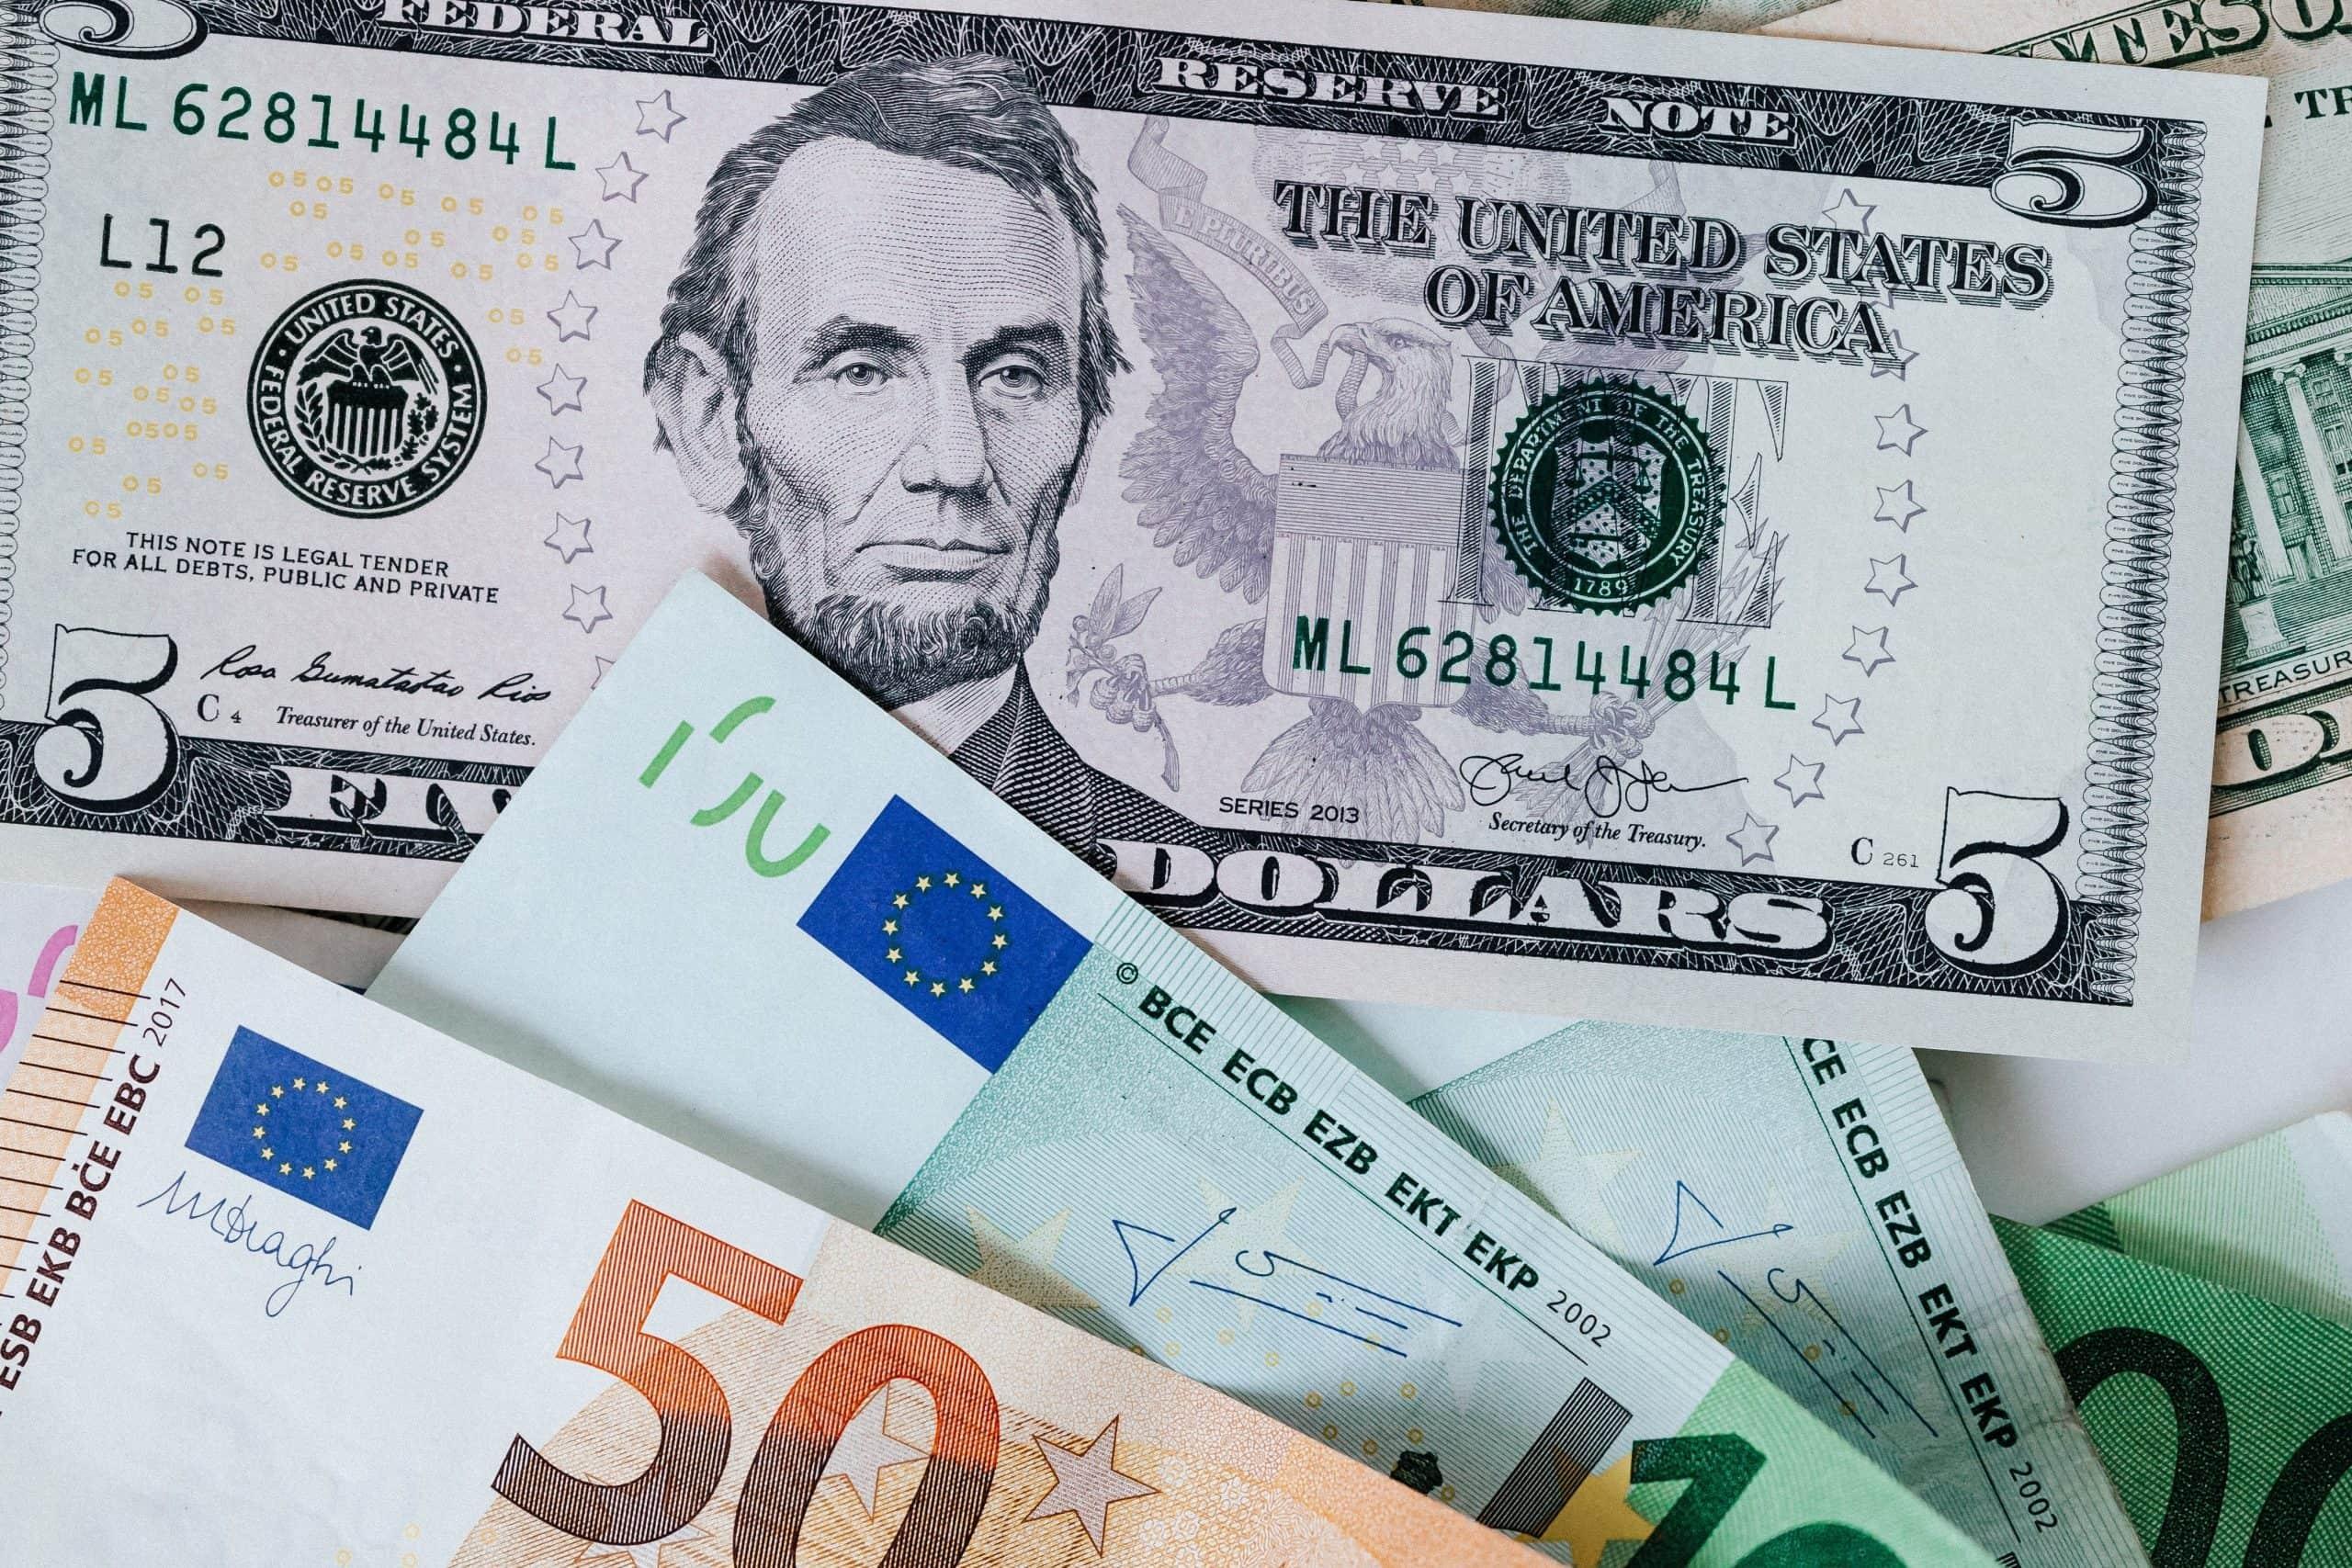 Banknotes: mix of dollars and euros